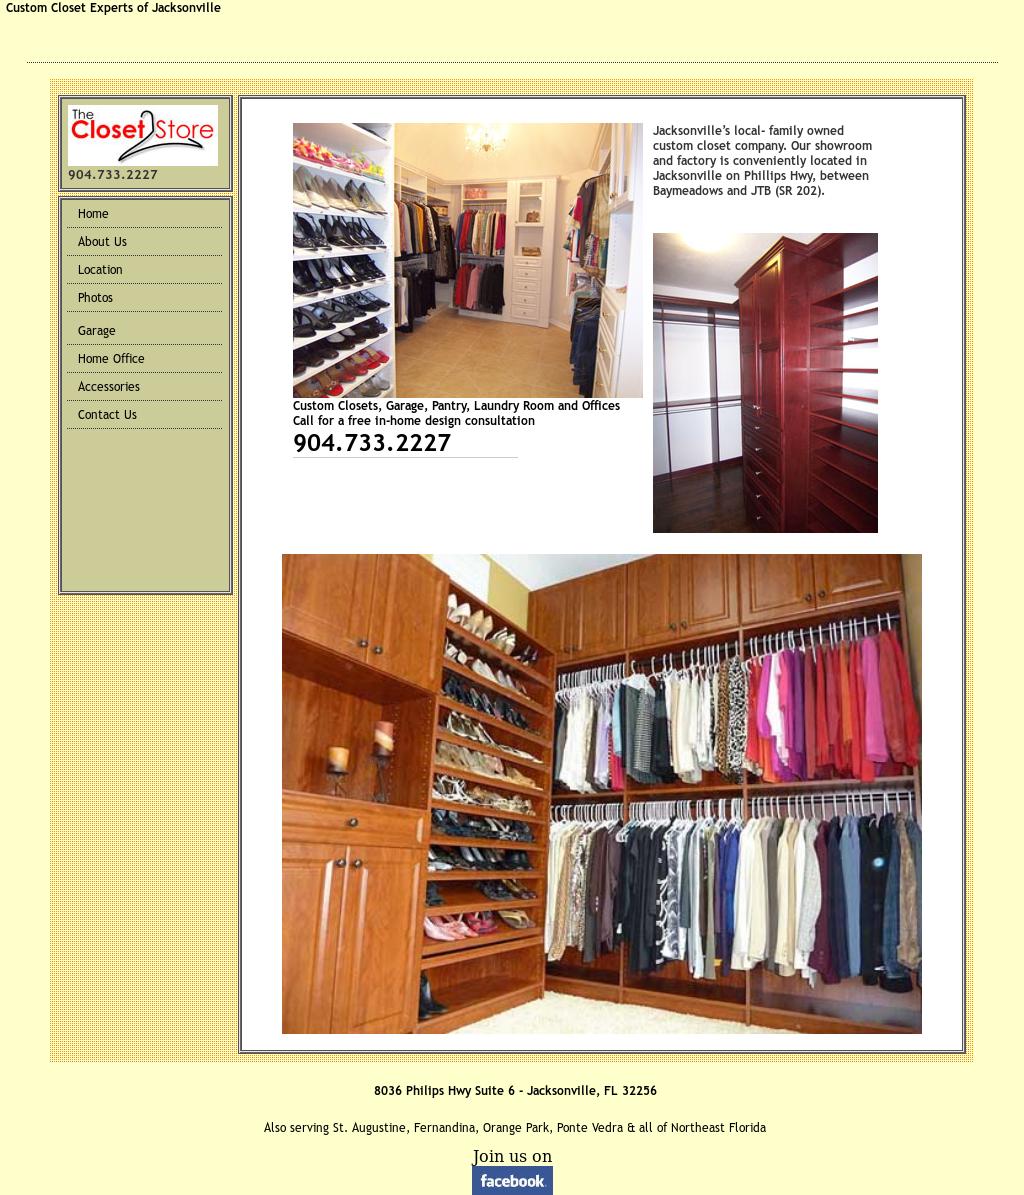 Amazing The Closet Store Website History